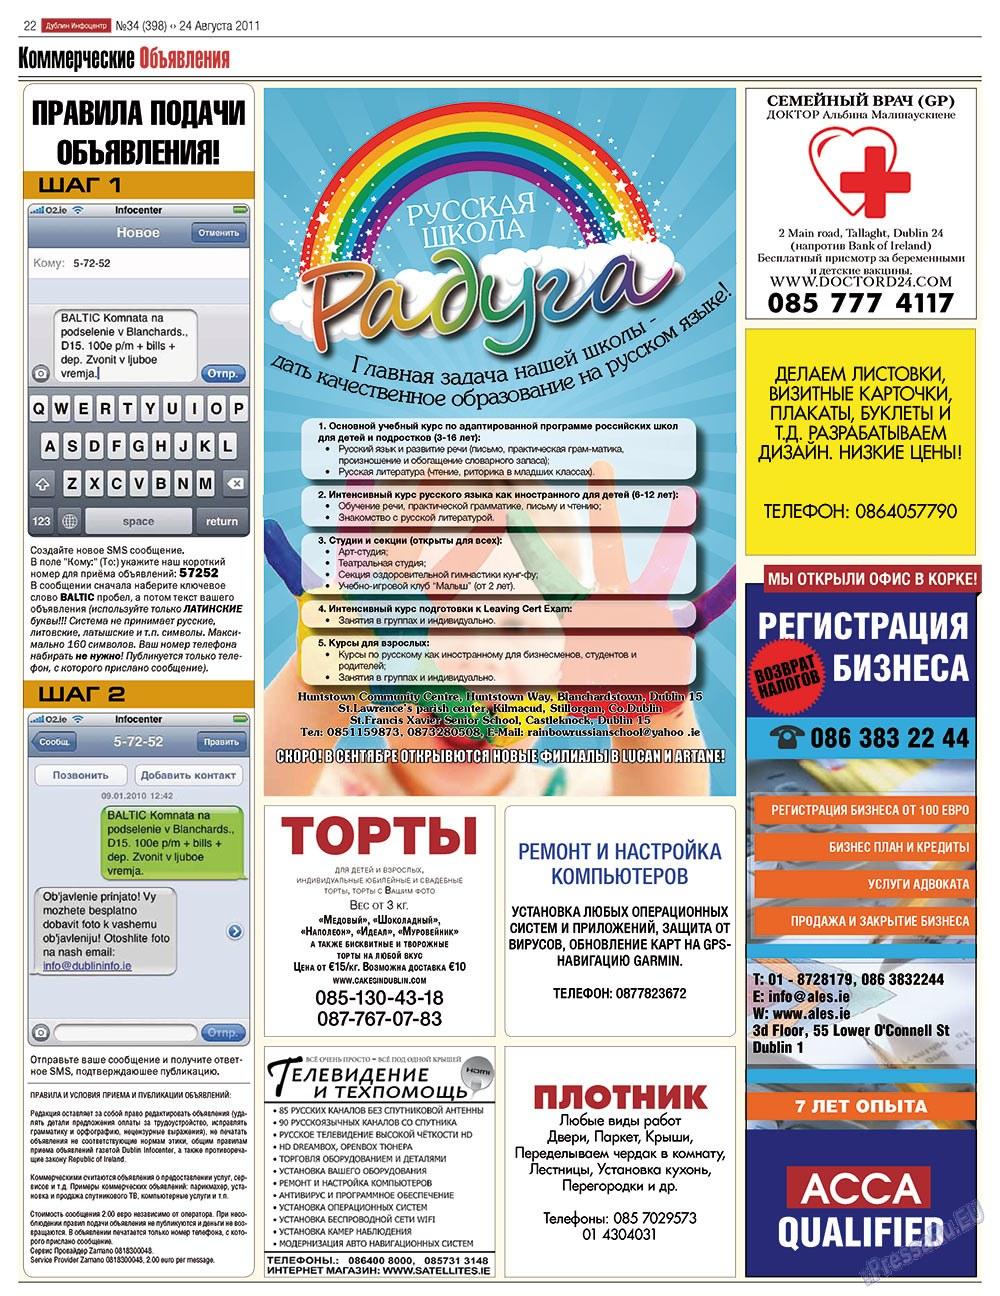 Дублин инфоцентр (газета). 2011 год, номер 34, стр. 22